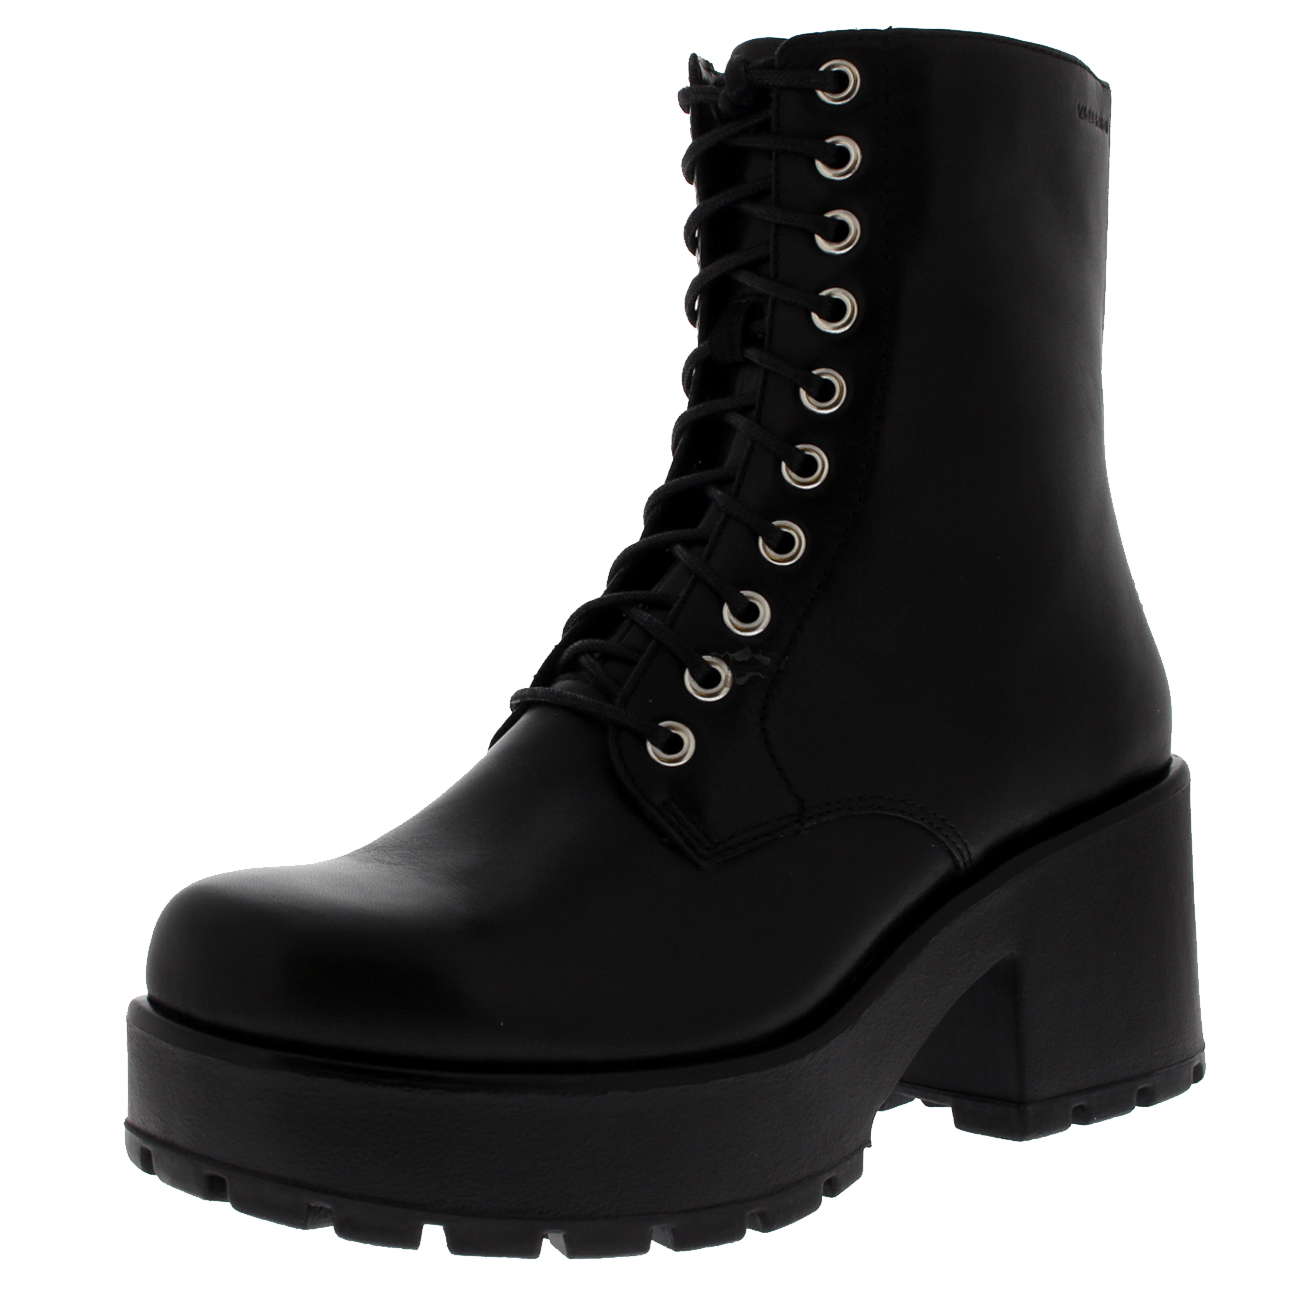 Womens Vagabond Dioon Festival Leather Black Casual Block Heels Boots US  5.5-10 9041ddc6fc